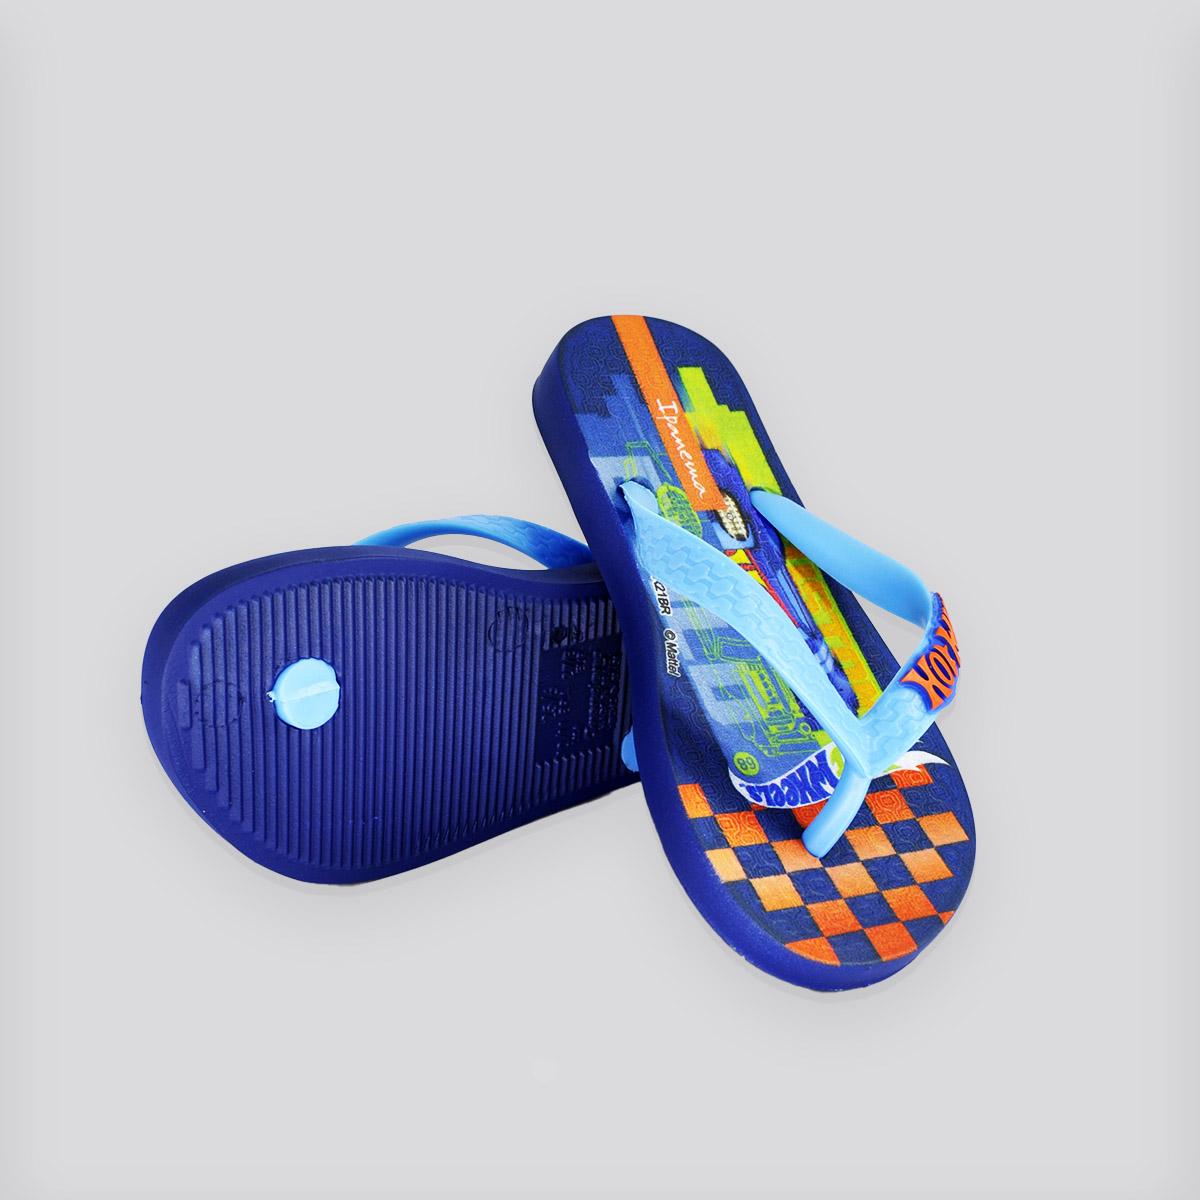 Chinelo Infantil Ipanema Hot Wheels Tyre Azul/Laranja